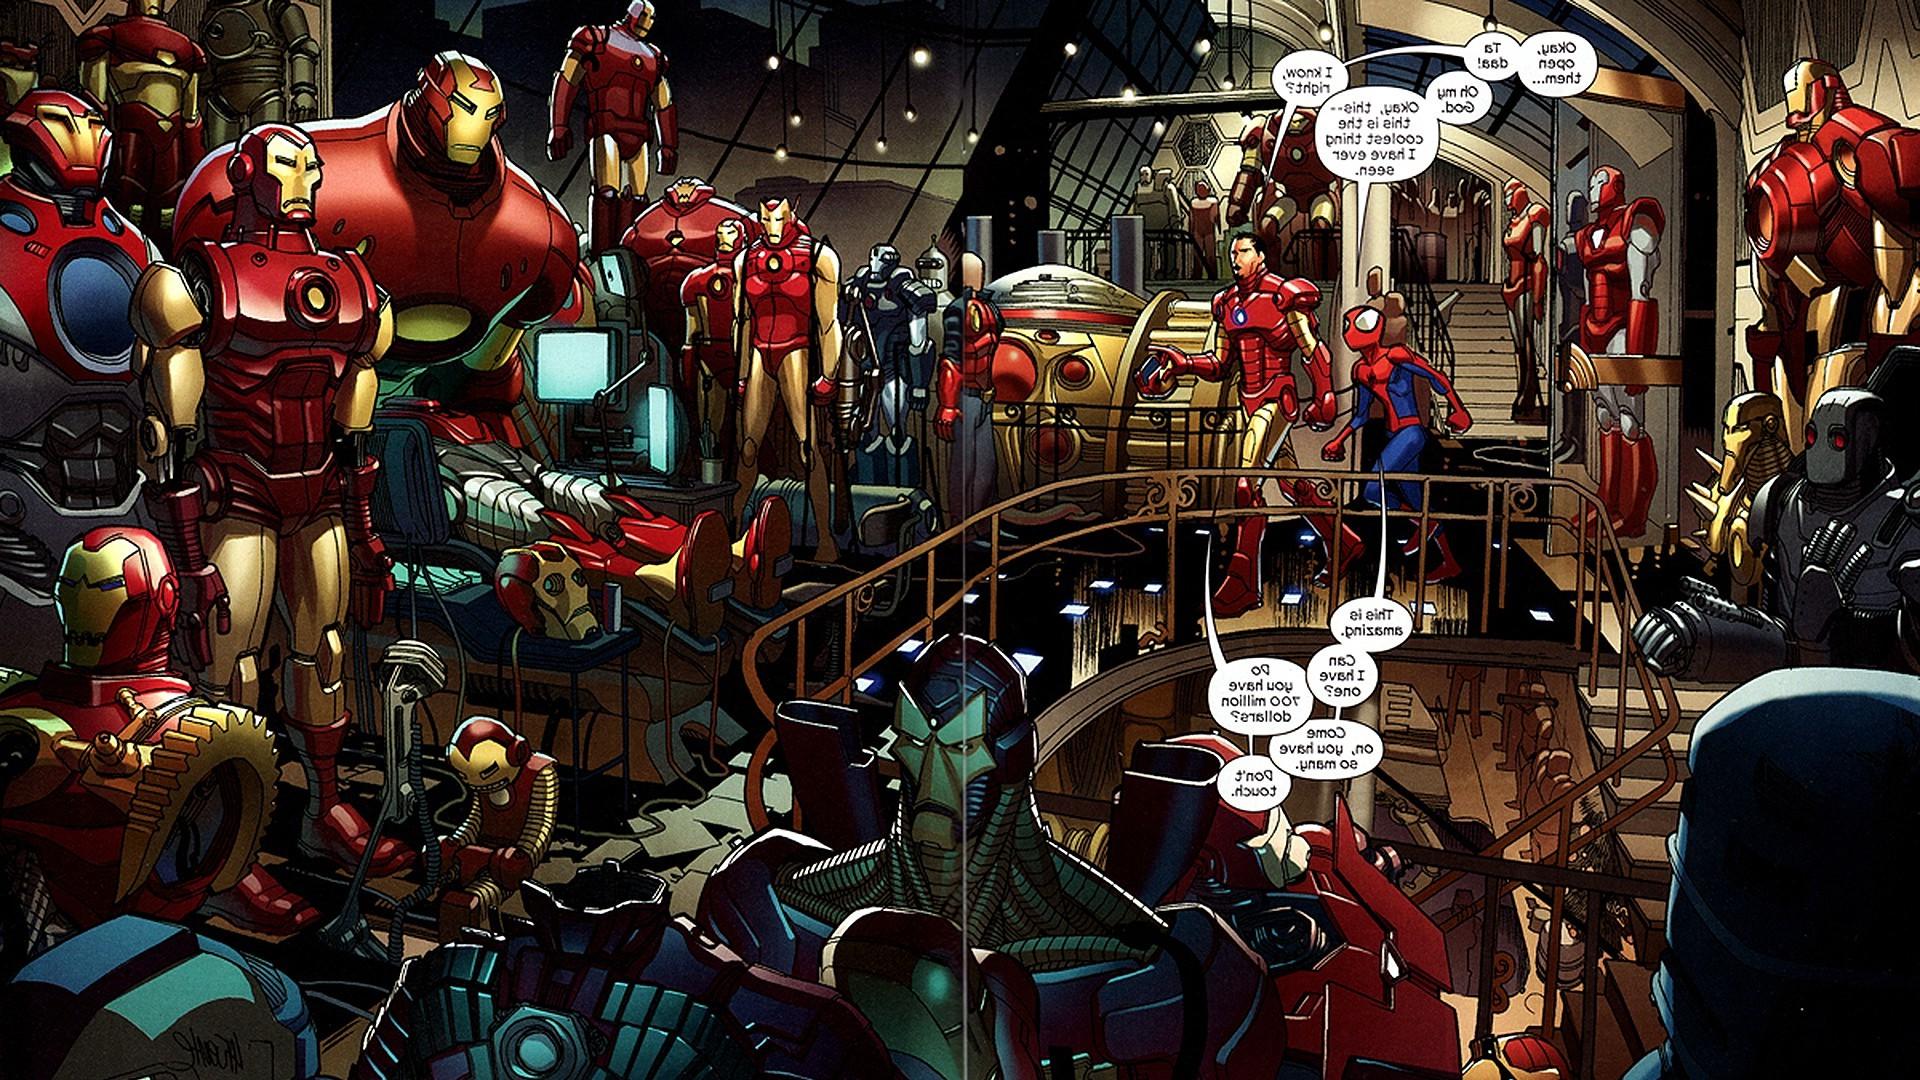 Wallpaper 1920x1080 Px Bender Comics Iron Man Spider Man